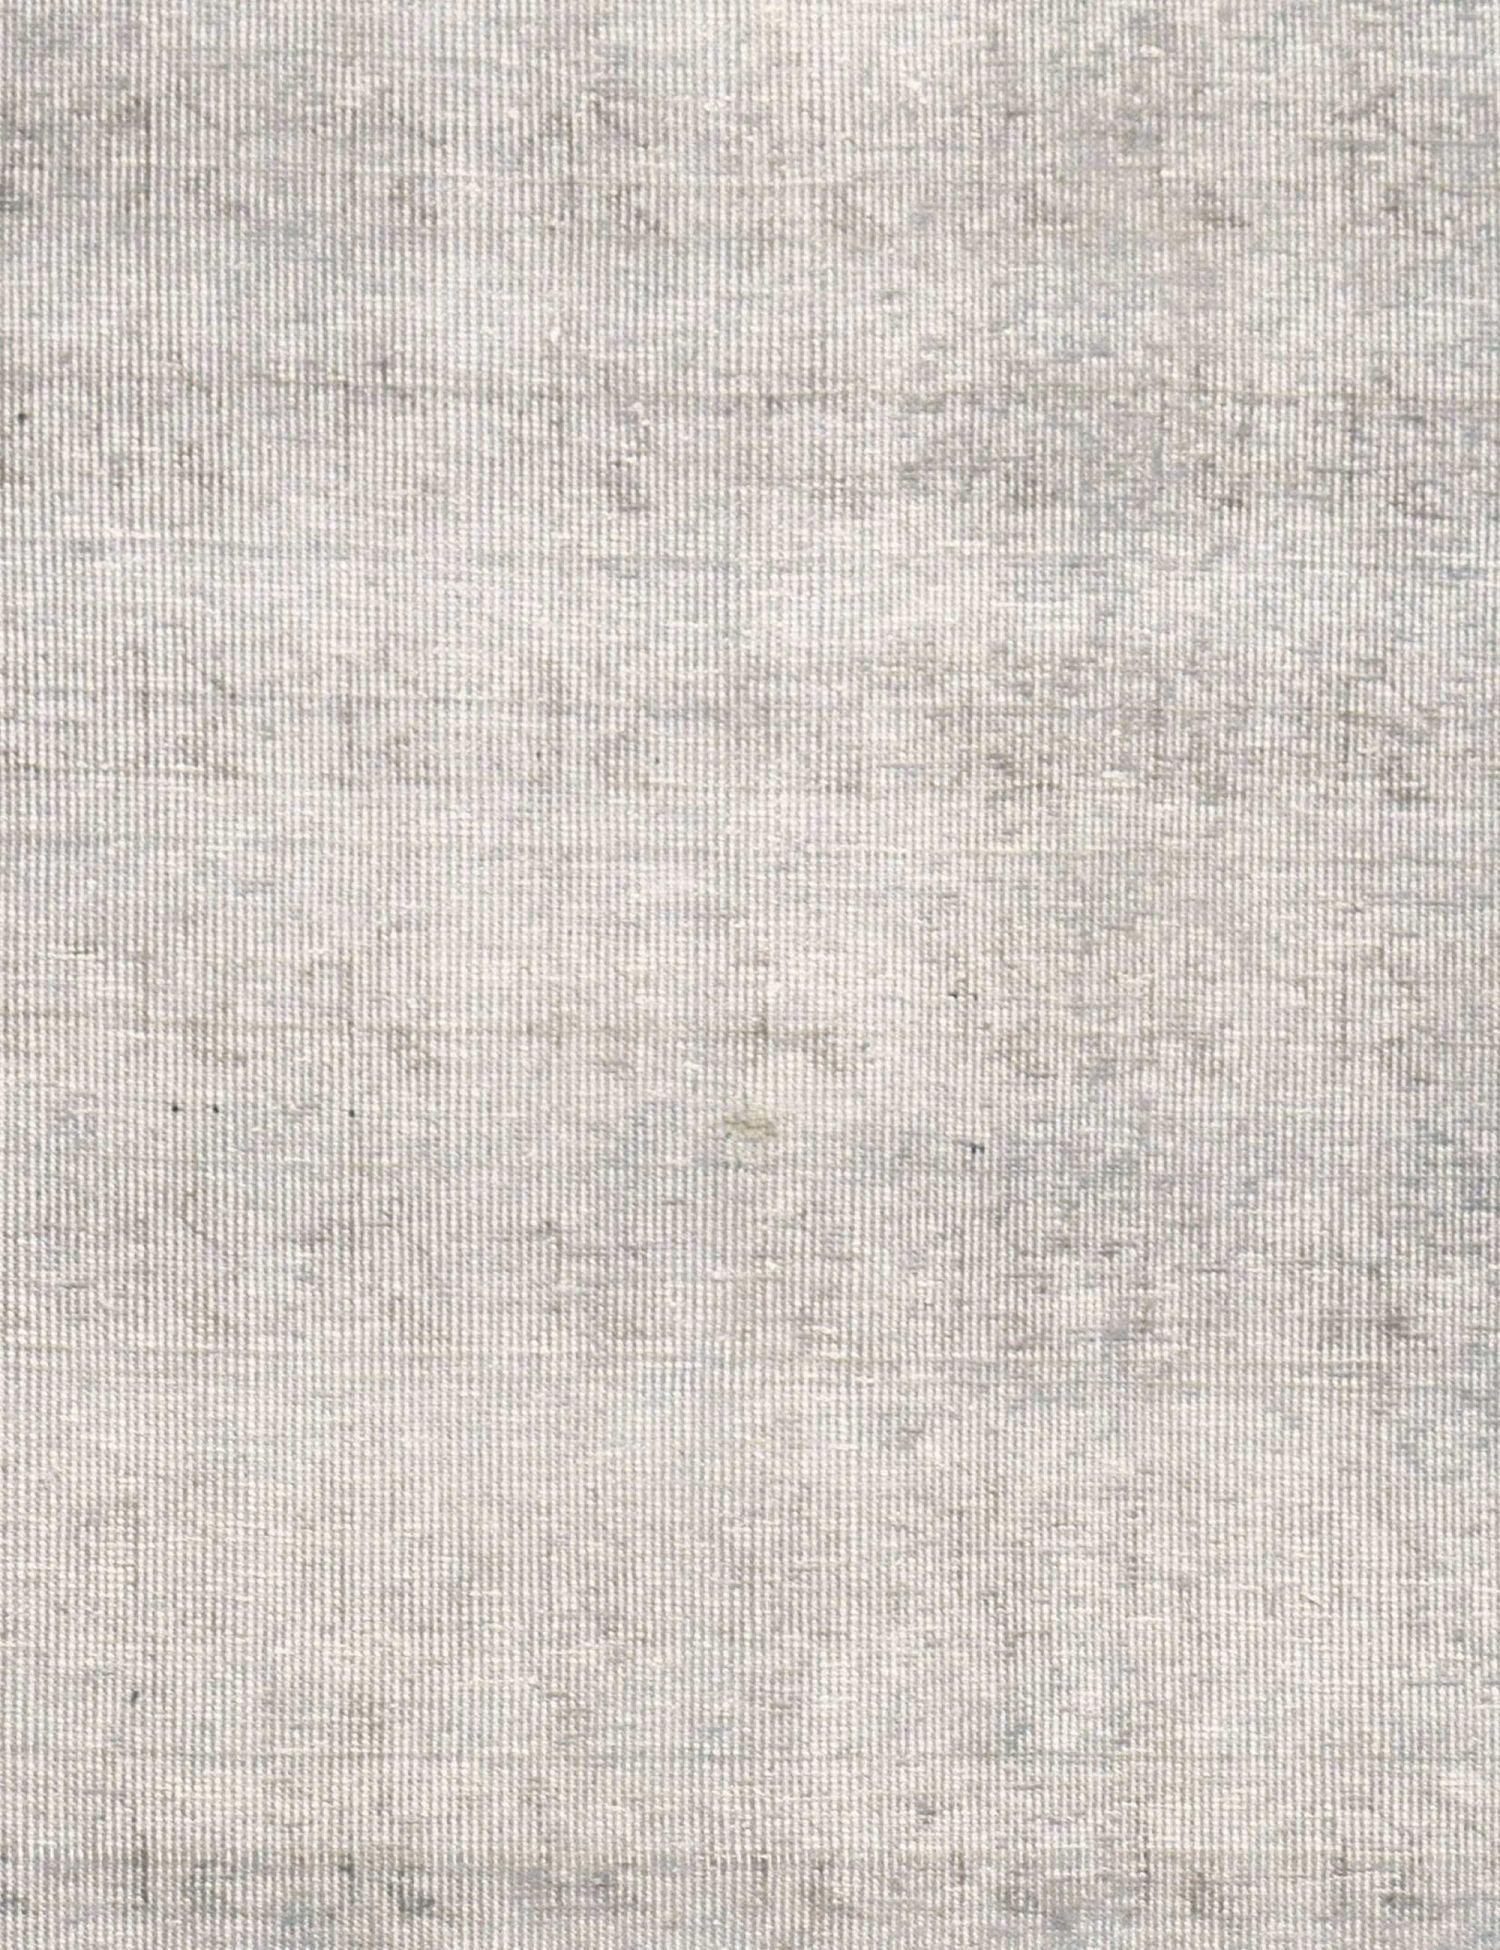 Tappeto Vintage  grigo <br/>137 x 80 cm